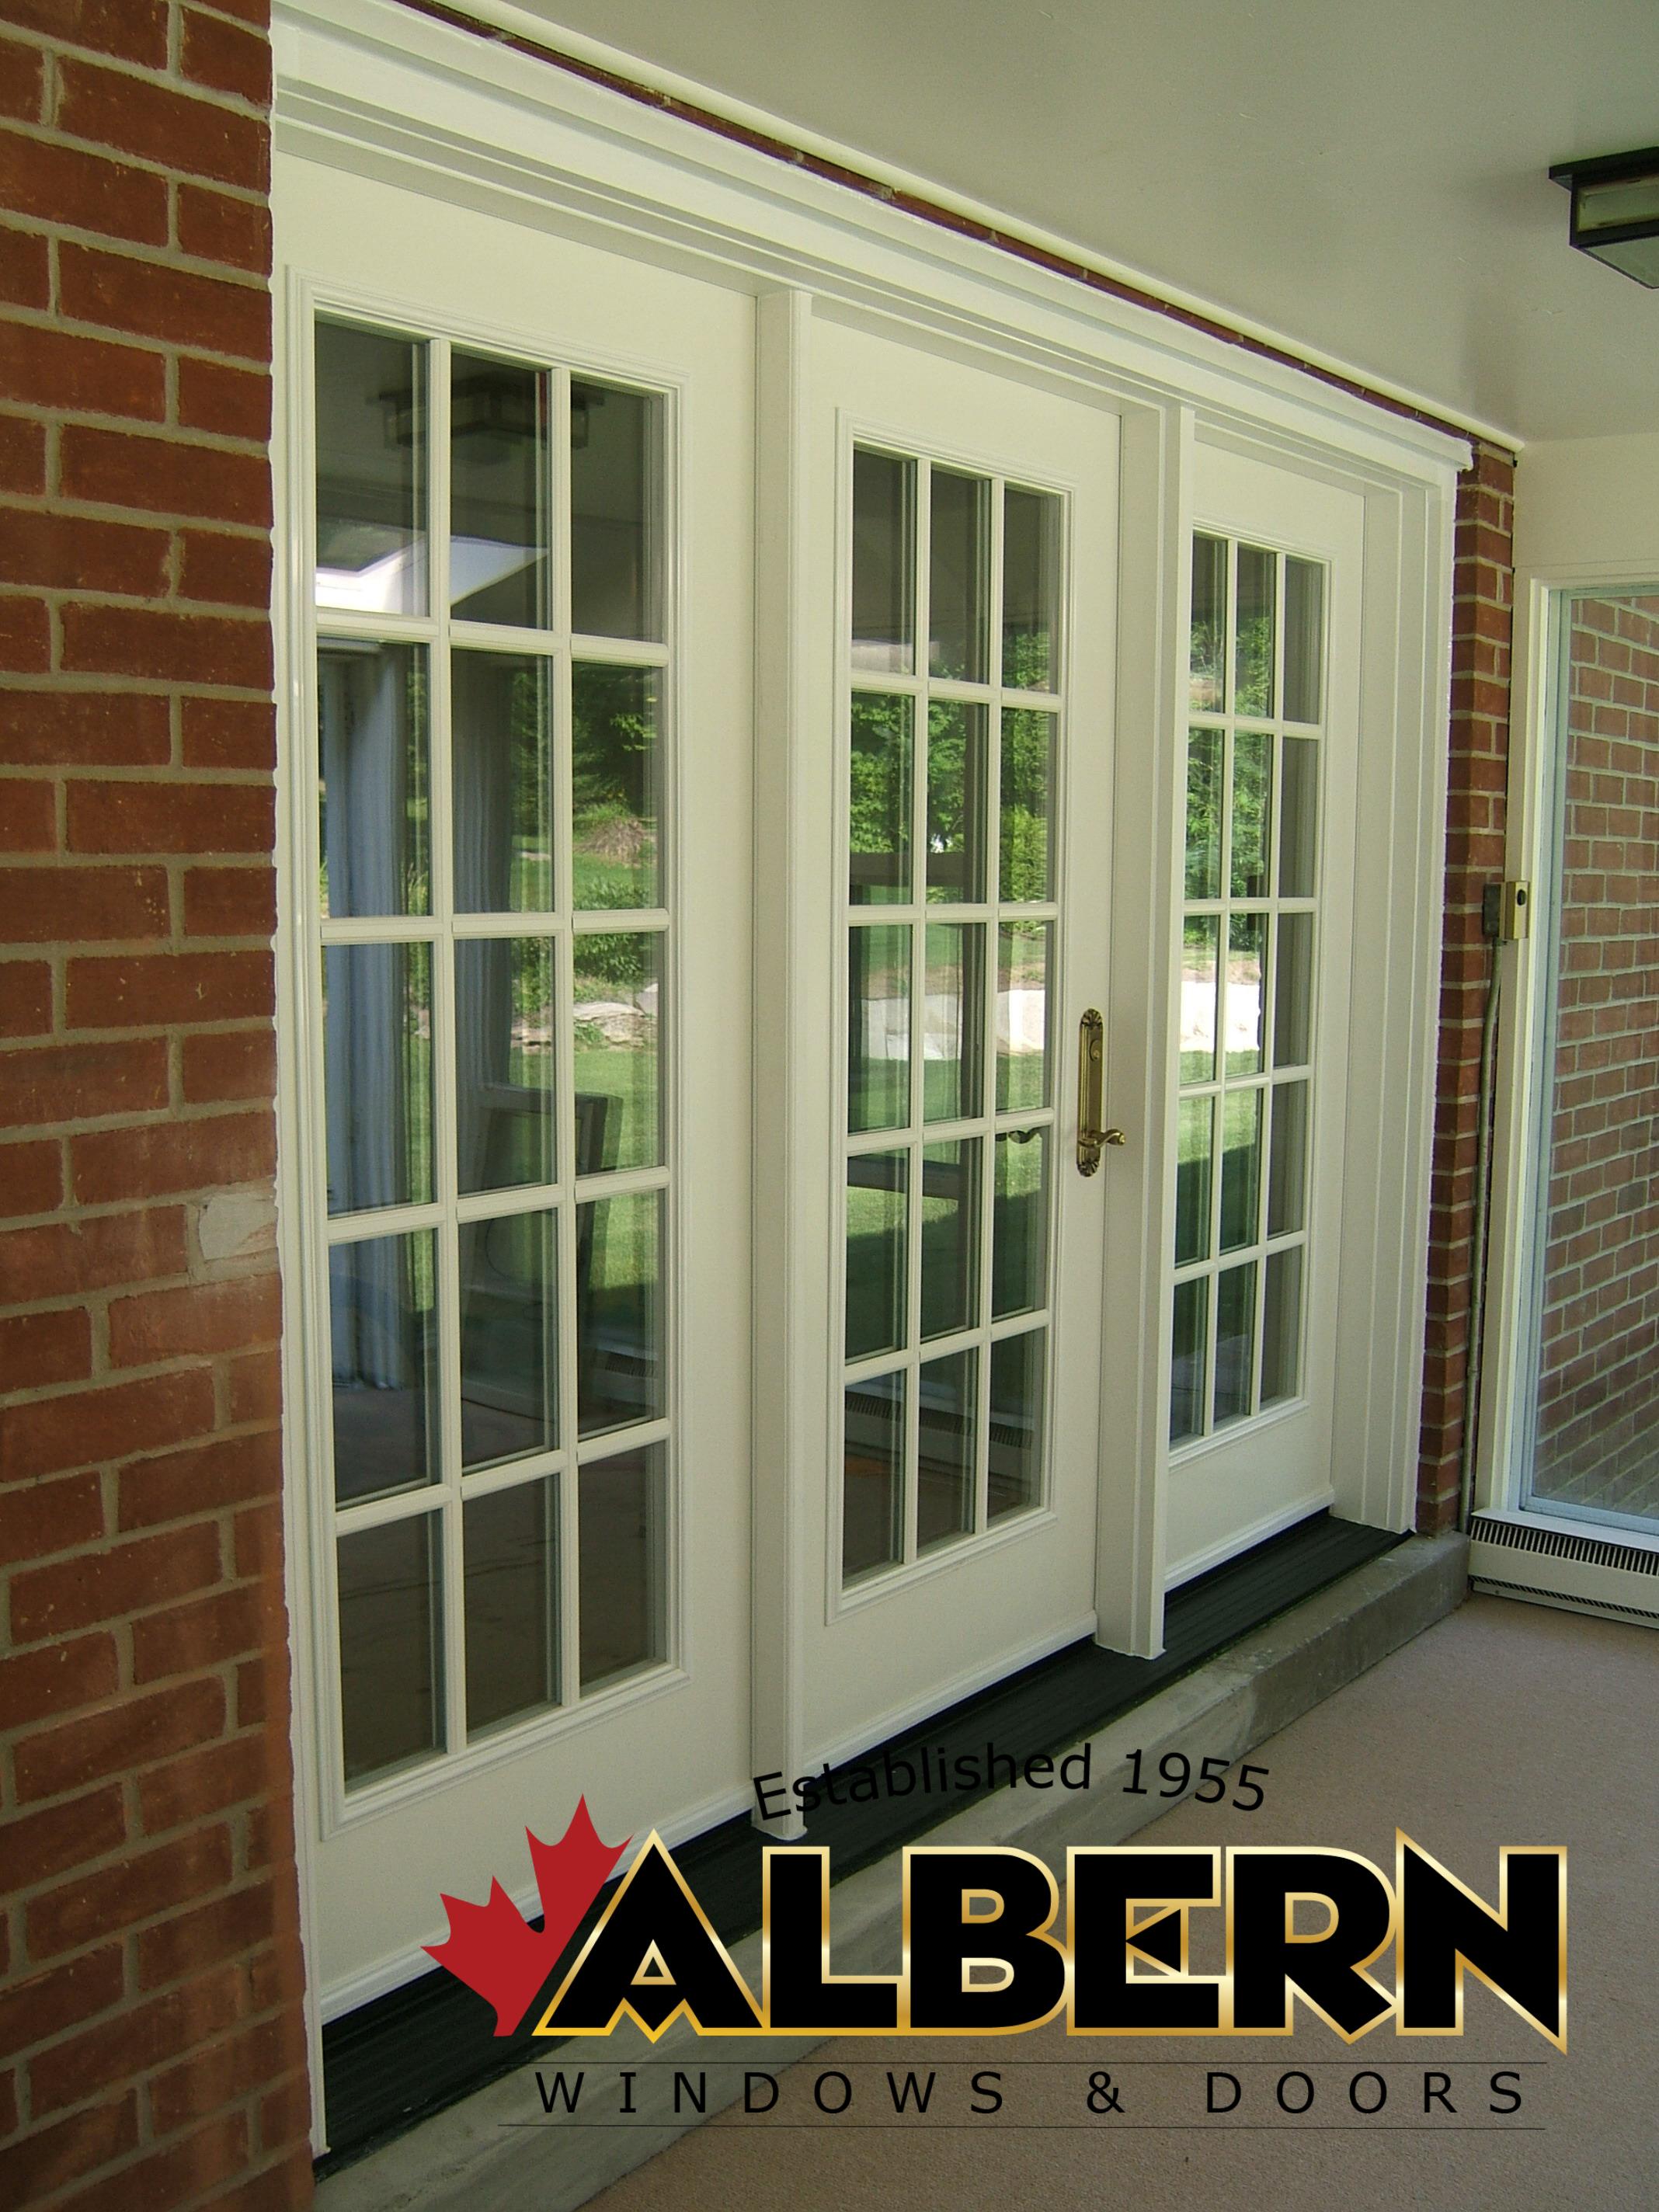 Albern Windows and Doors (26).jpg